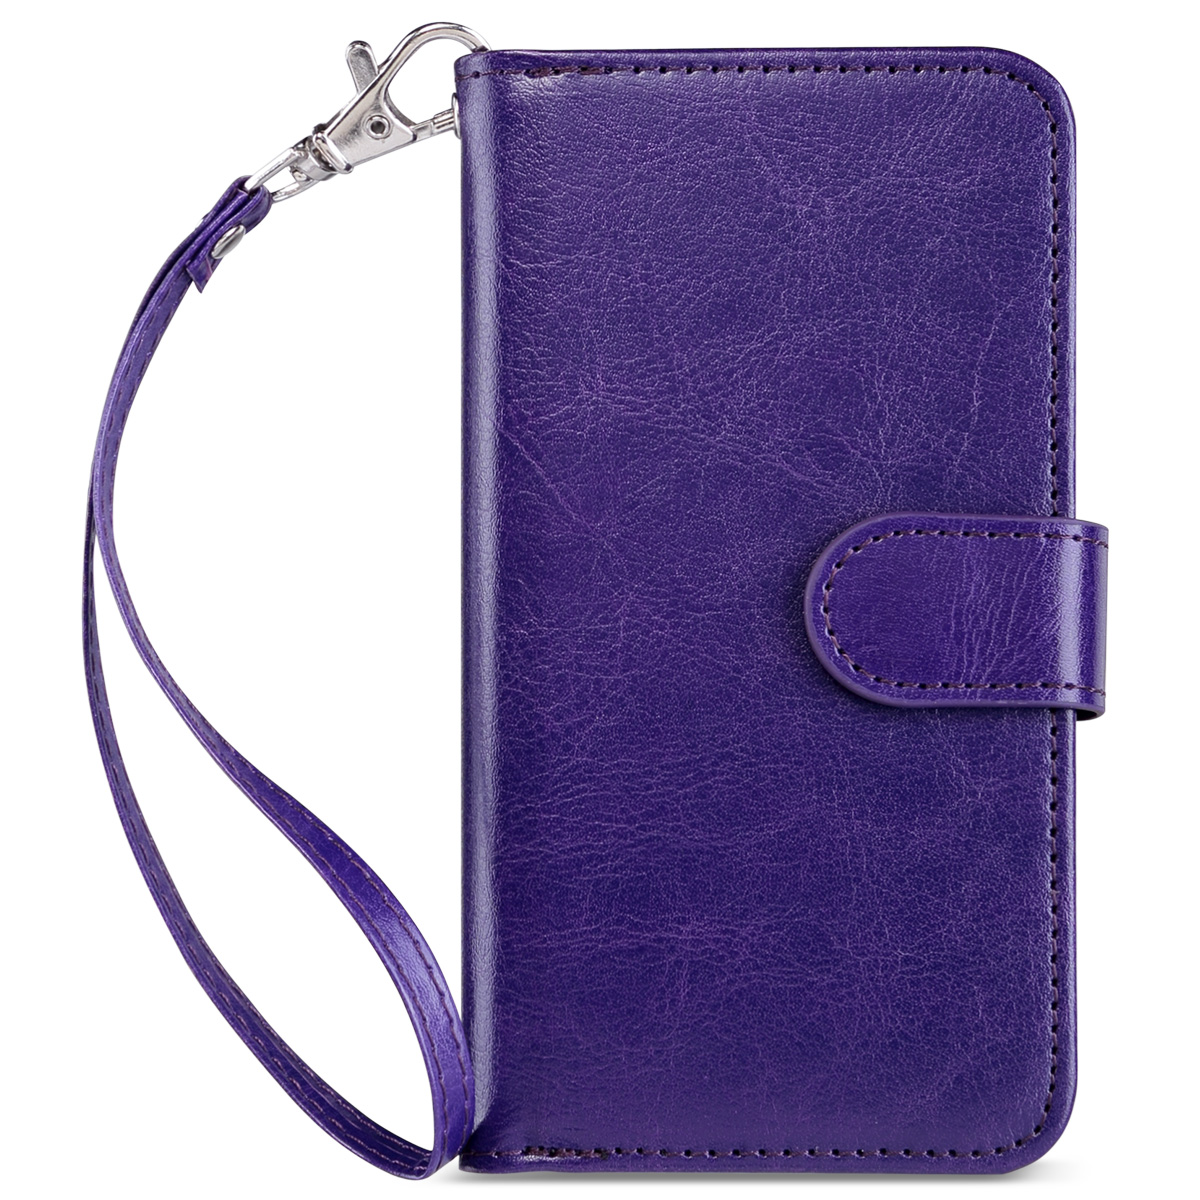 iphone 7 plus wallet case amazon